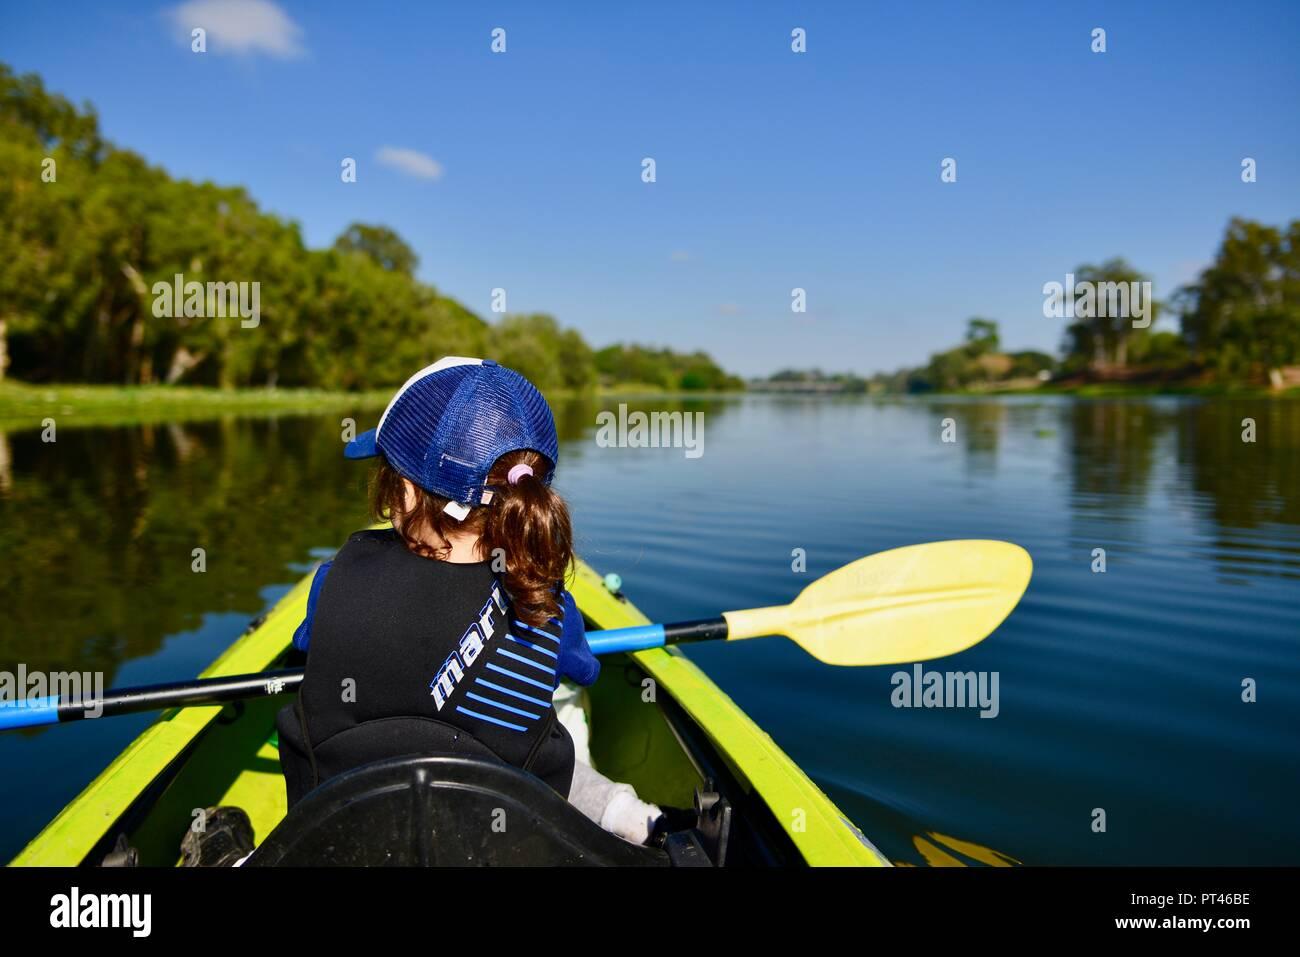 Niños remando en una canoa en el clima hermoso, Ross River QLD, Australia Foto de stock